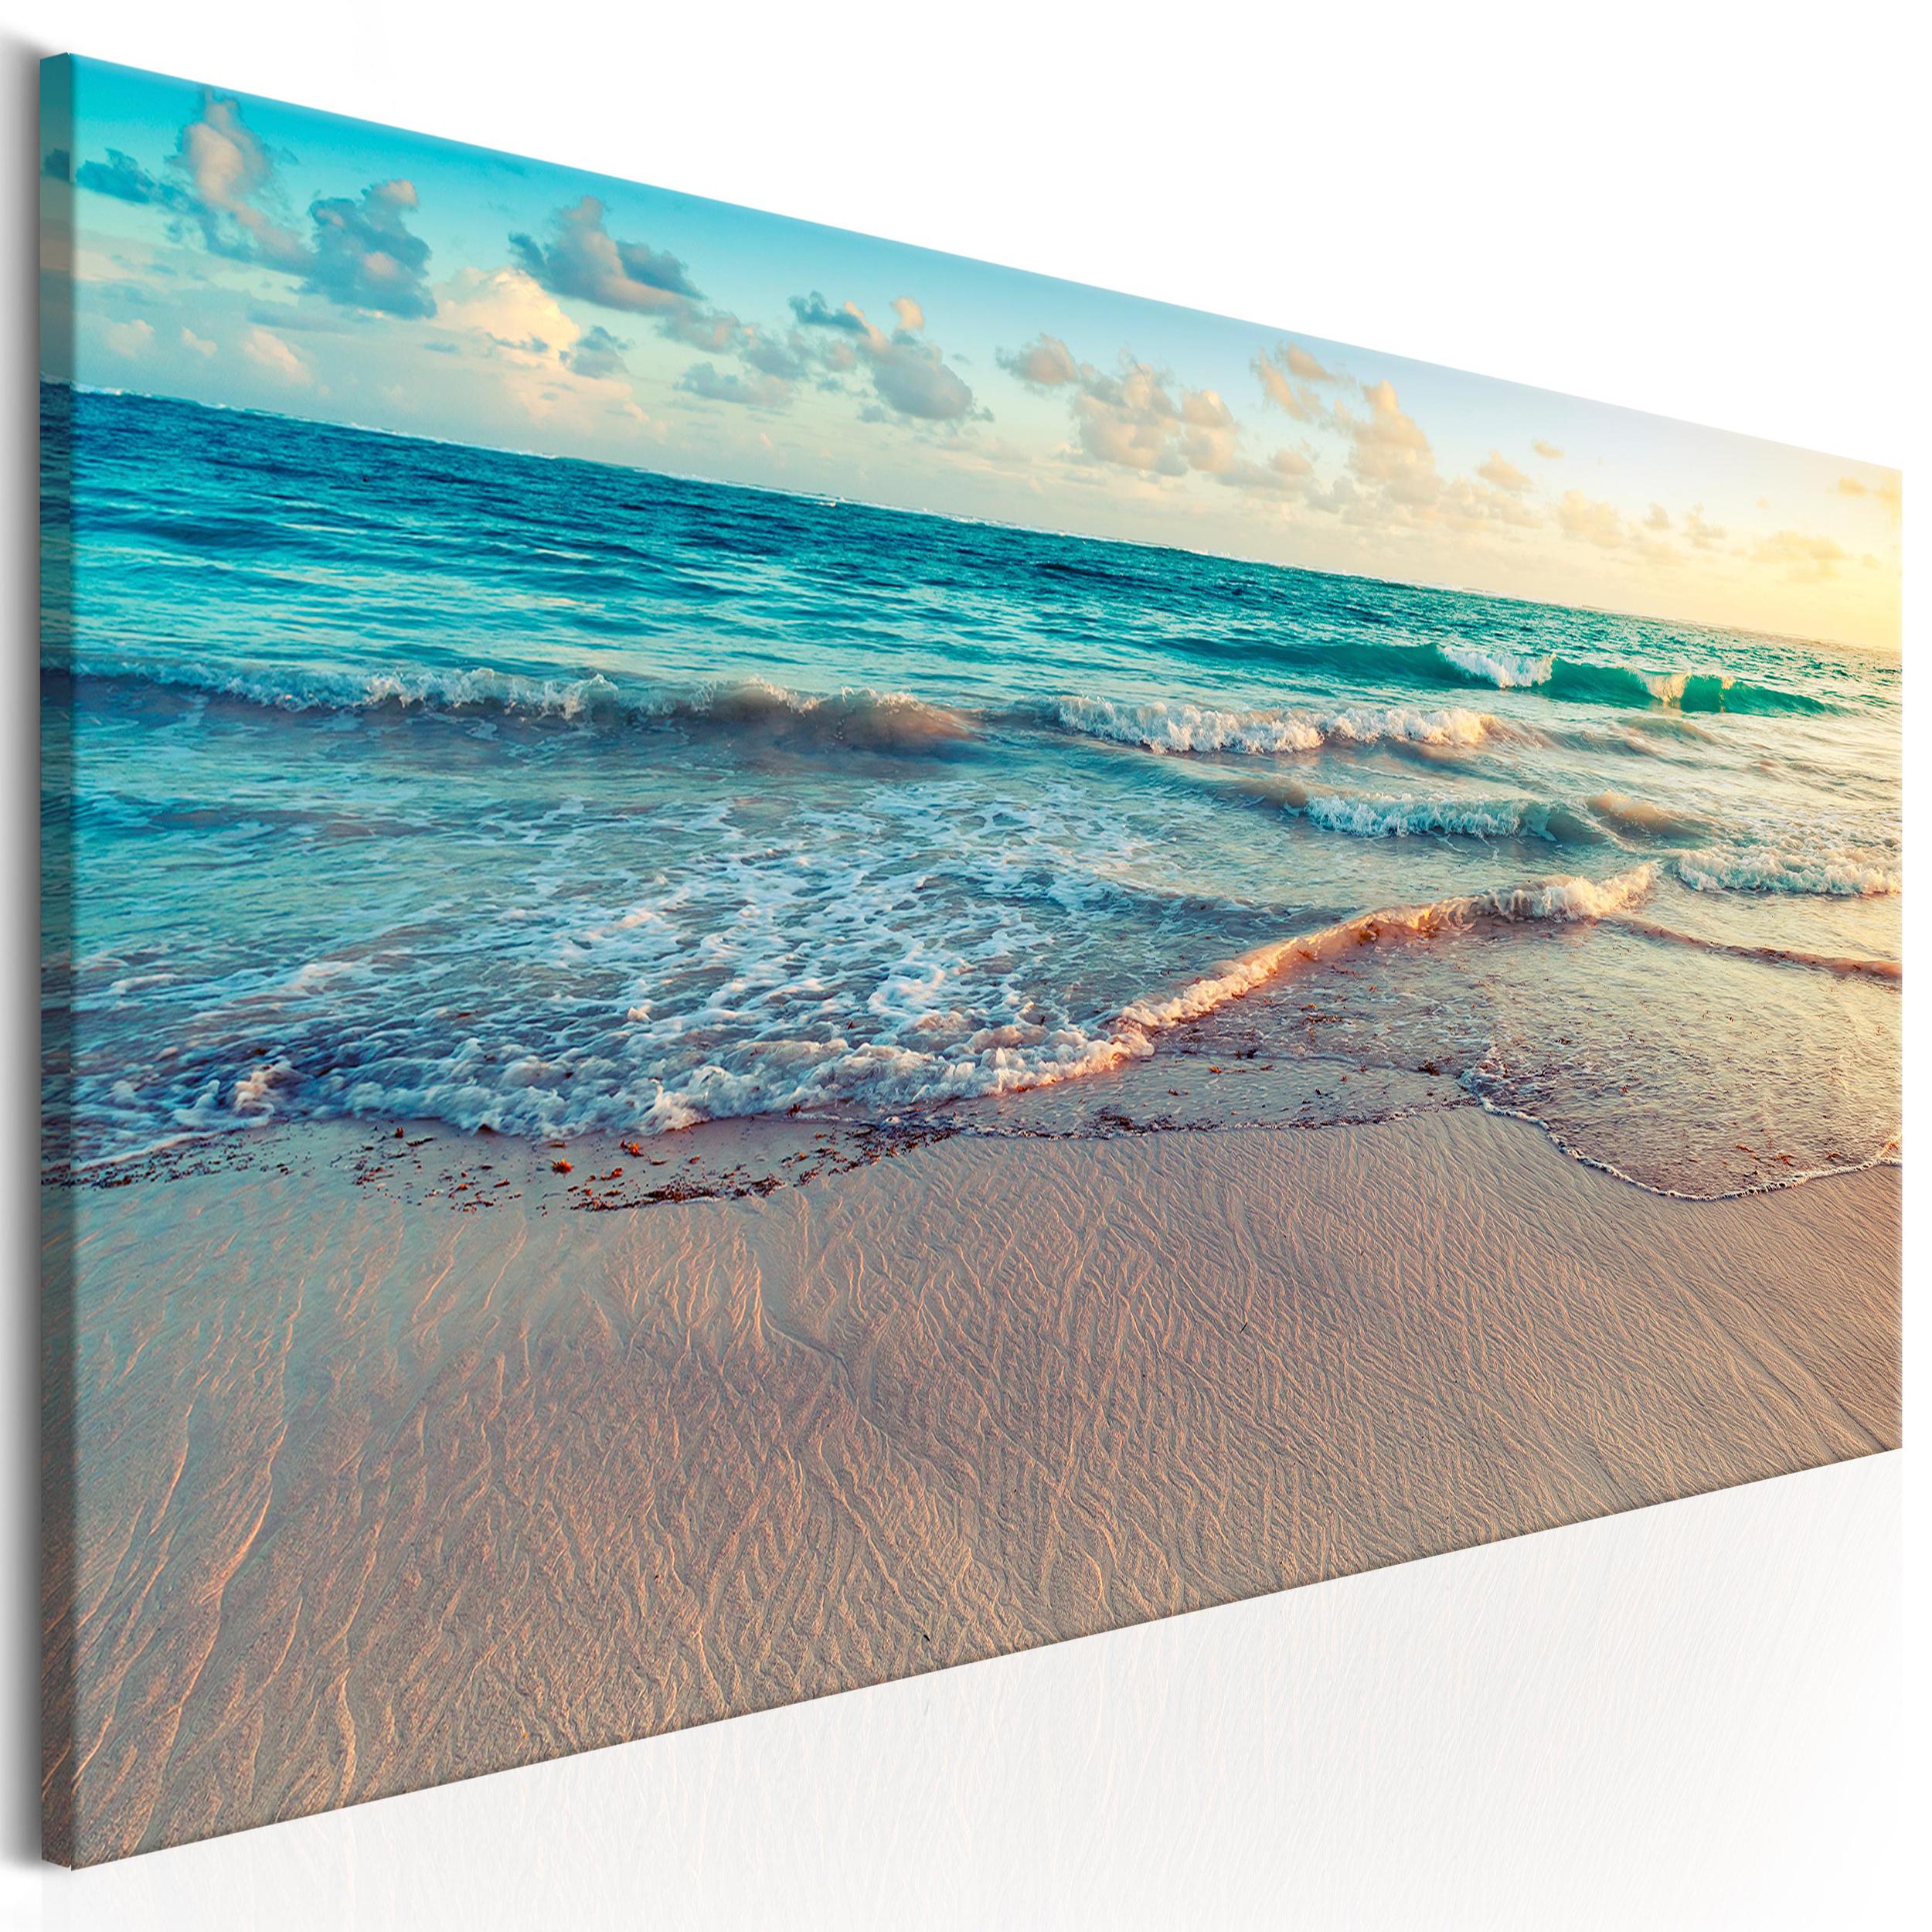 bilder leinwand bild meer strand natur wandbilder xxl kunstdruck akustikbild 470 ebay. Black Bedroom Furniture Sets. Home Design Ideas